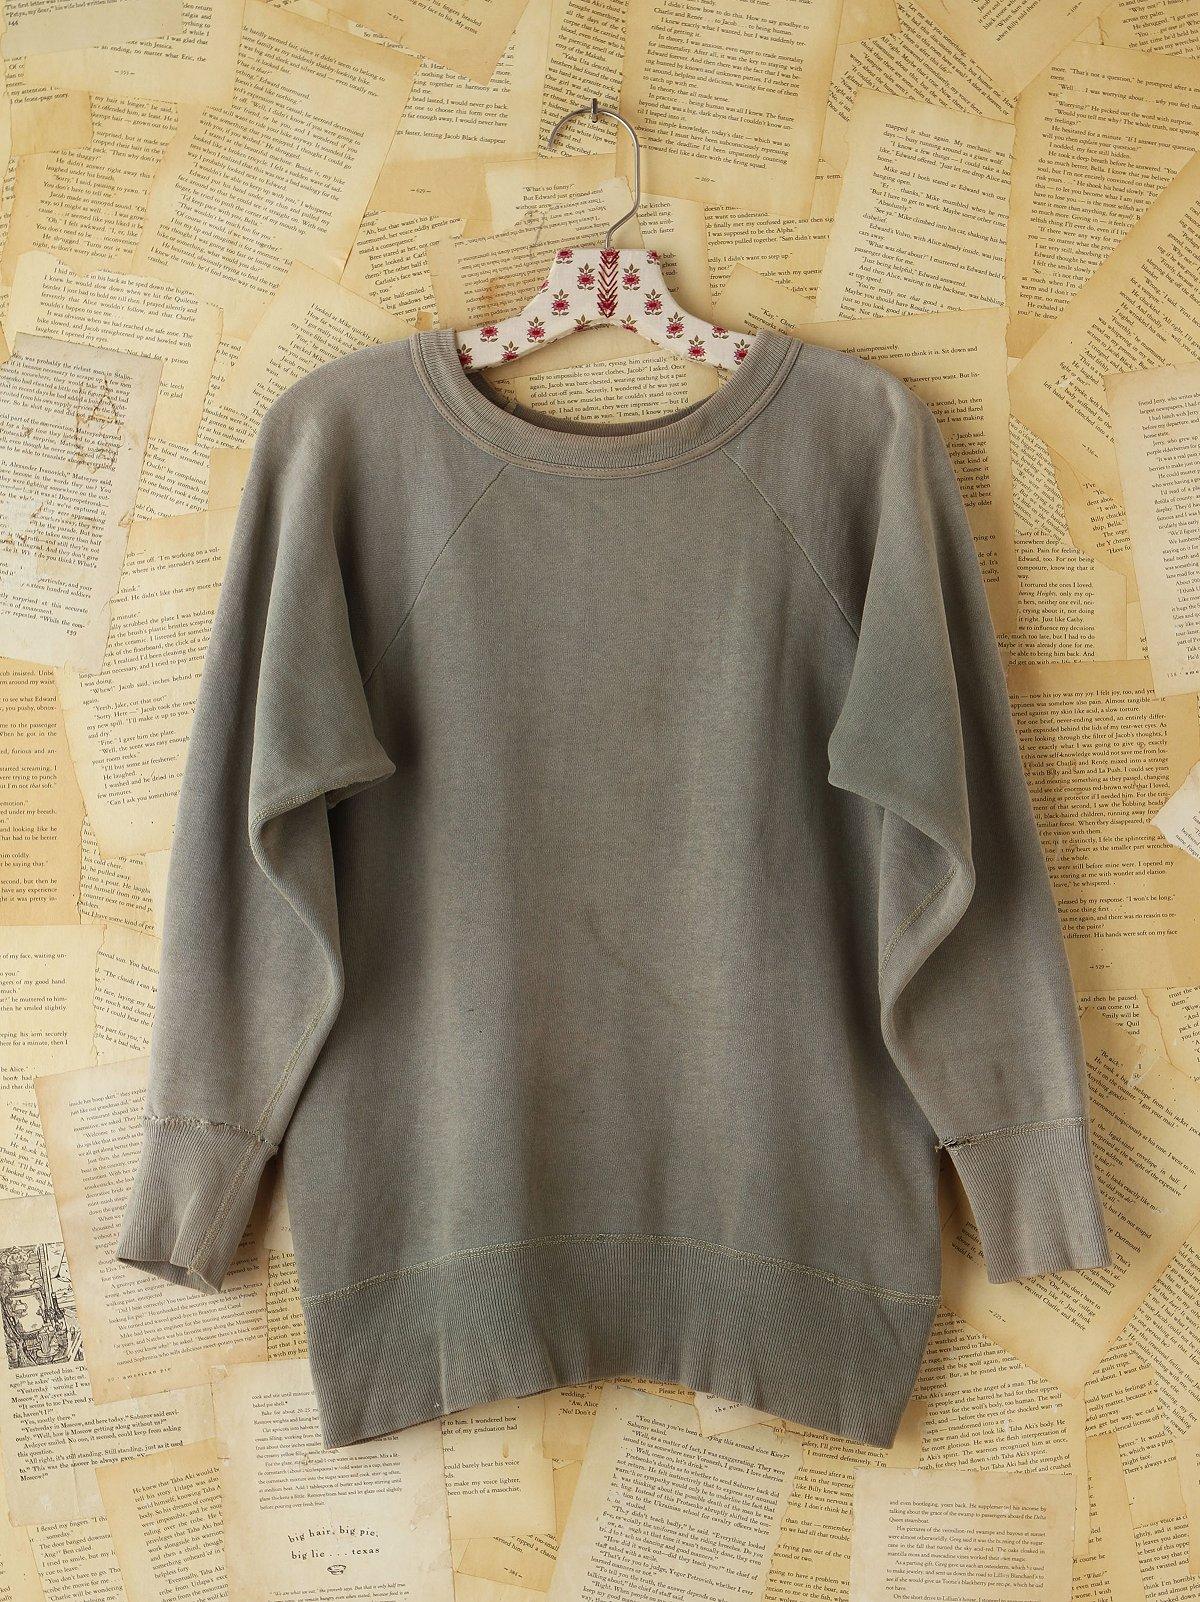 Vintage Army Sweatshirt